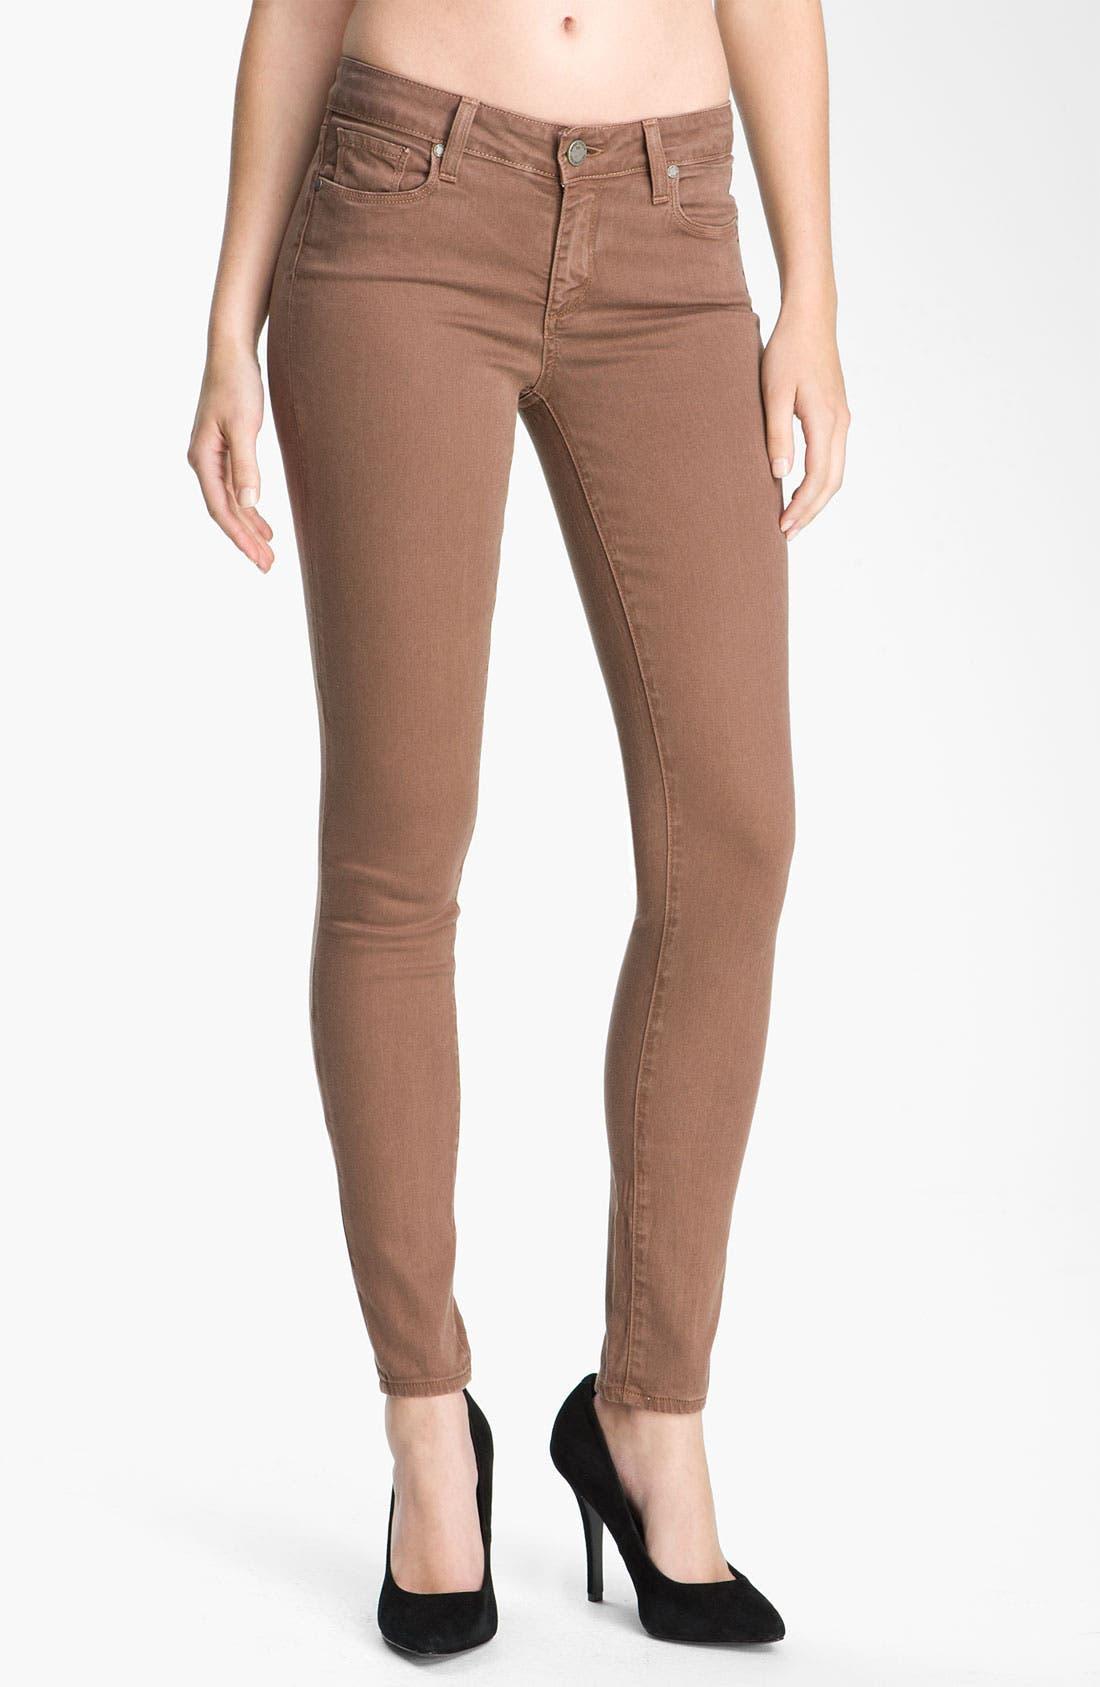 Alternate Image 1 Selected - Paige Denim 'Verdugo' Skinny Stretch Jeans (Rothko)